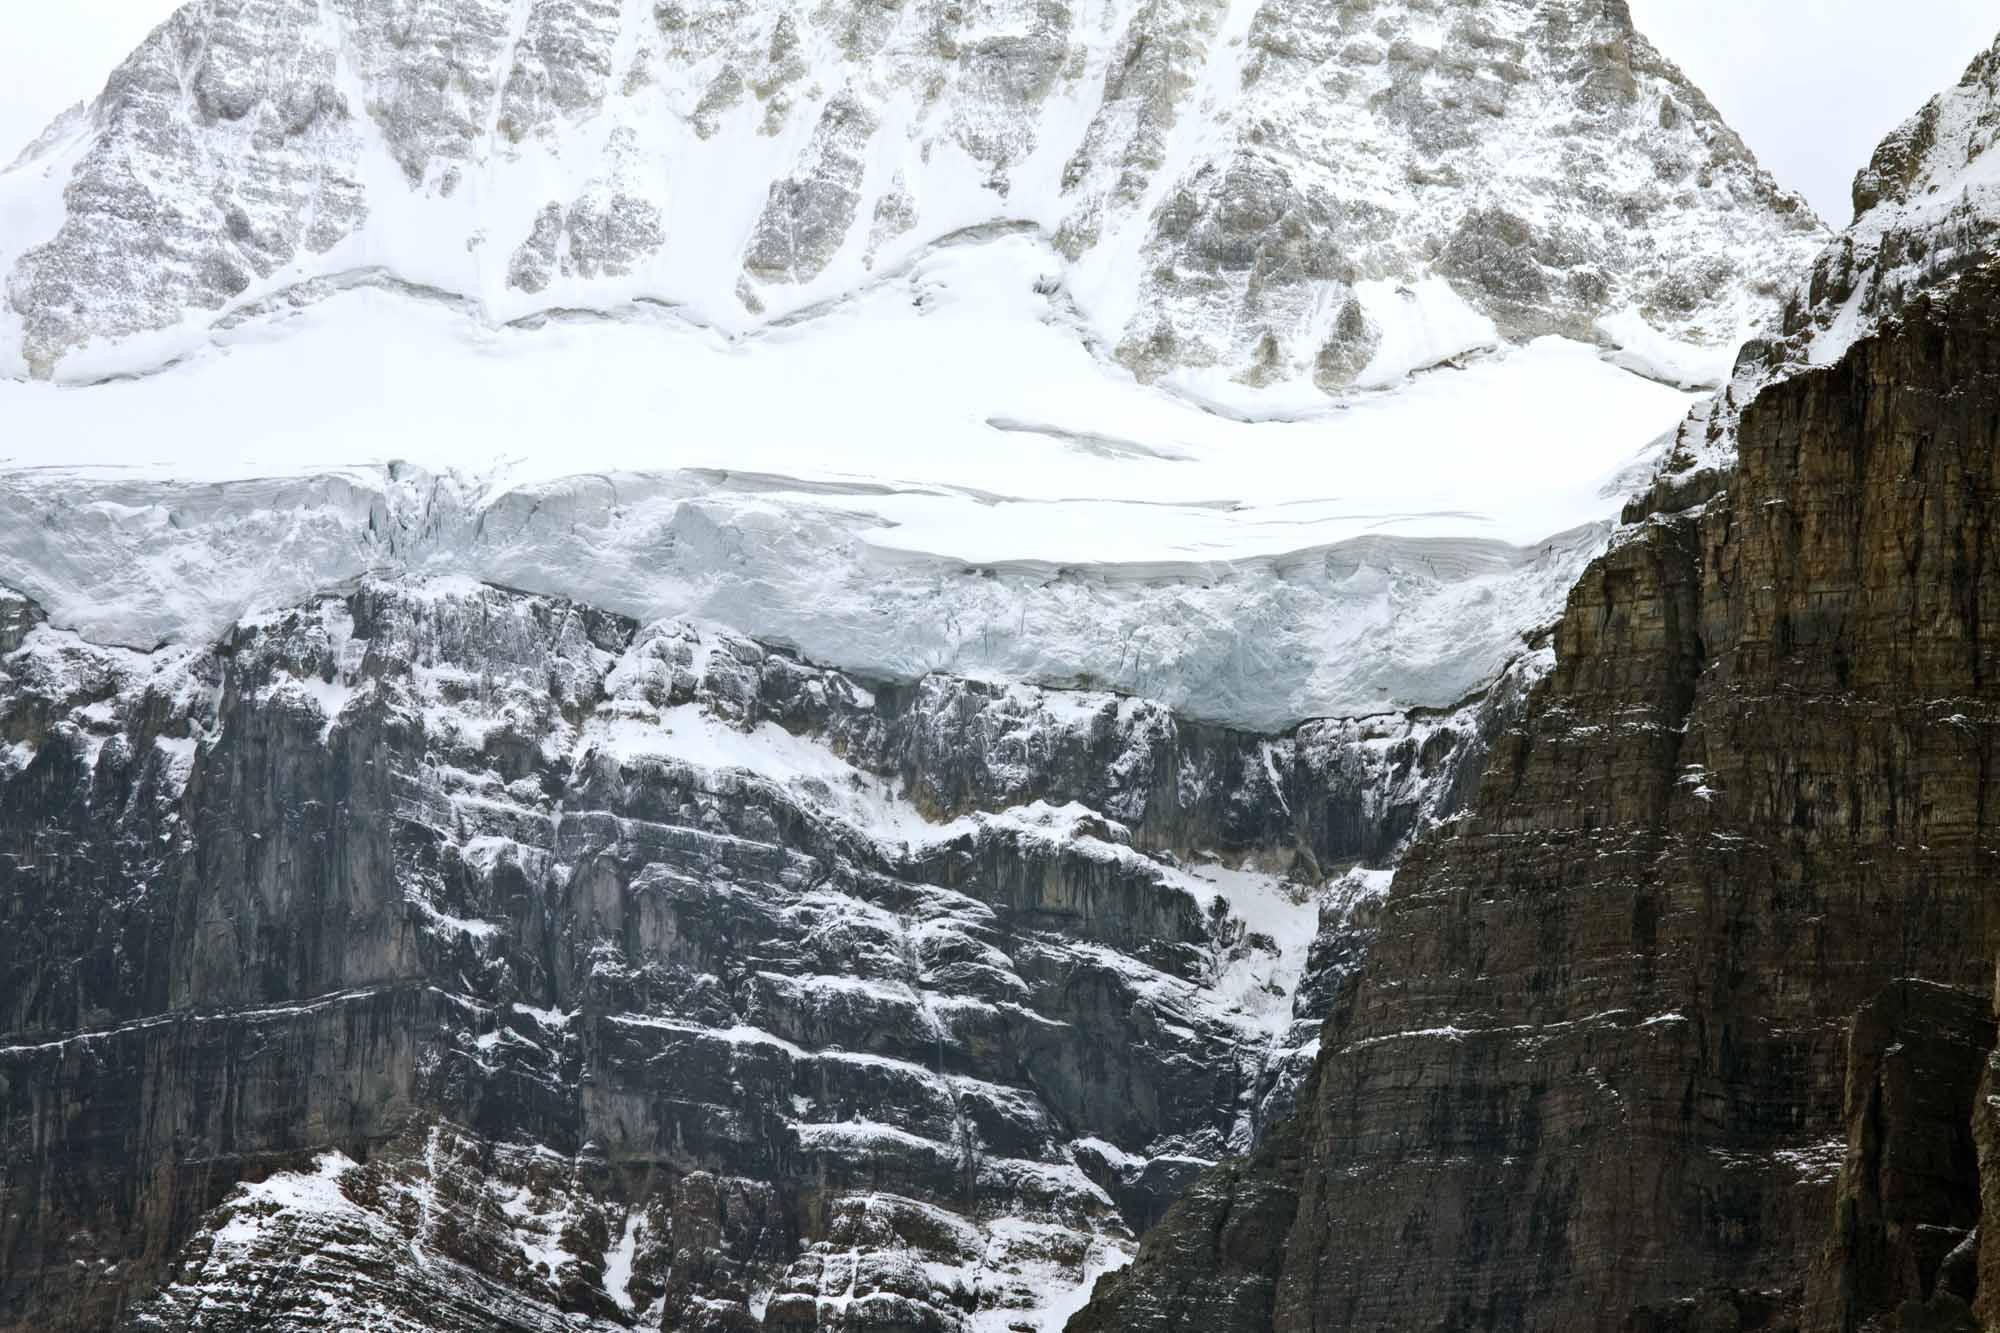 Scenic landscapes in Banff National Park, Alberta, Canada